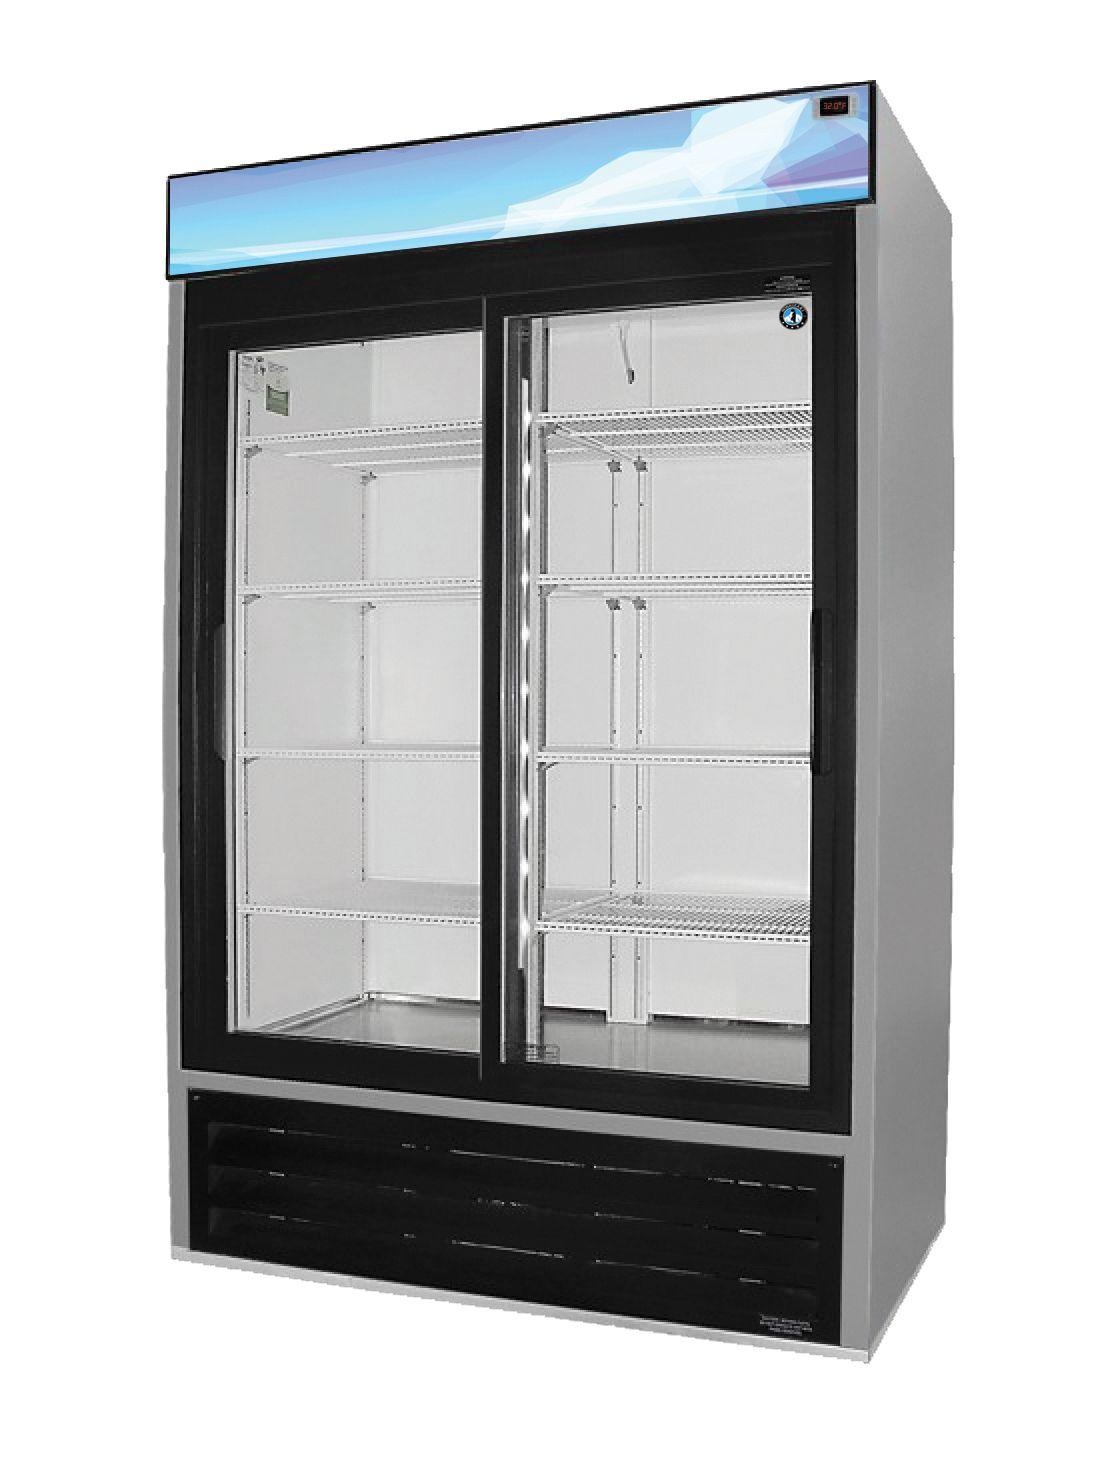 Rm 45 Sd Refrigerator Two Section Glass Door Merchandiser